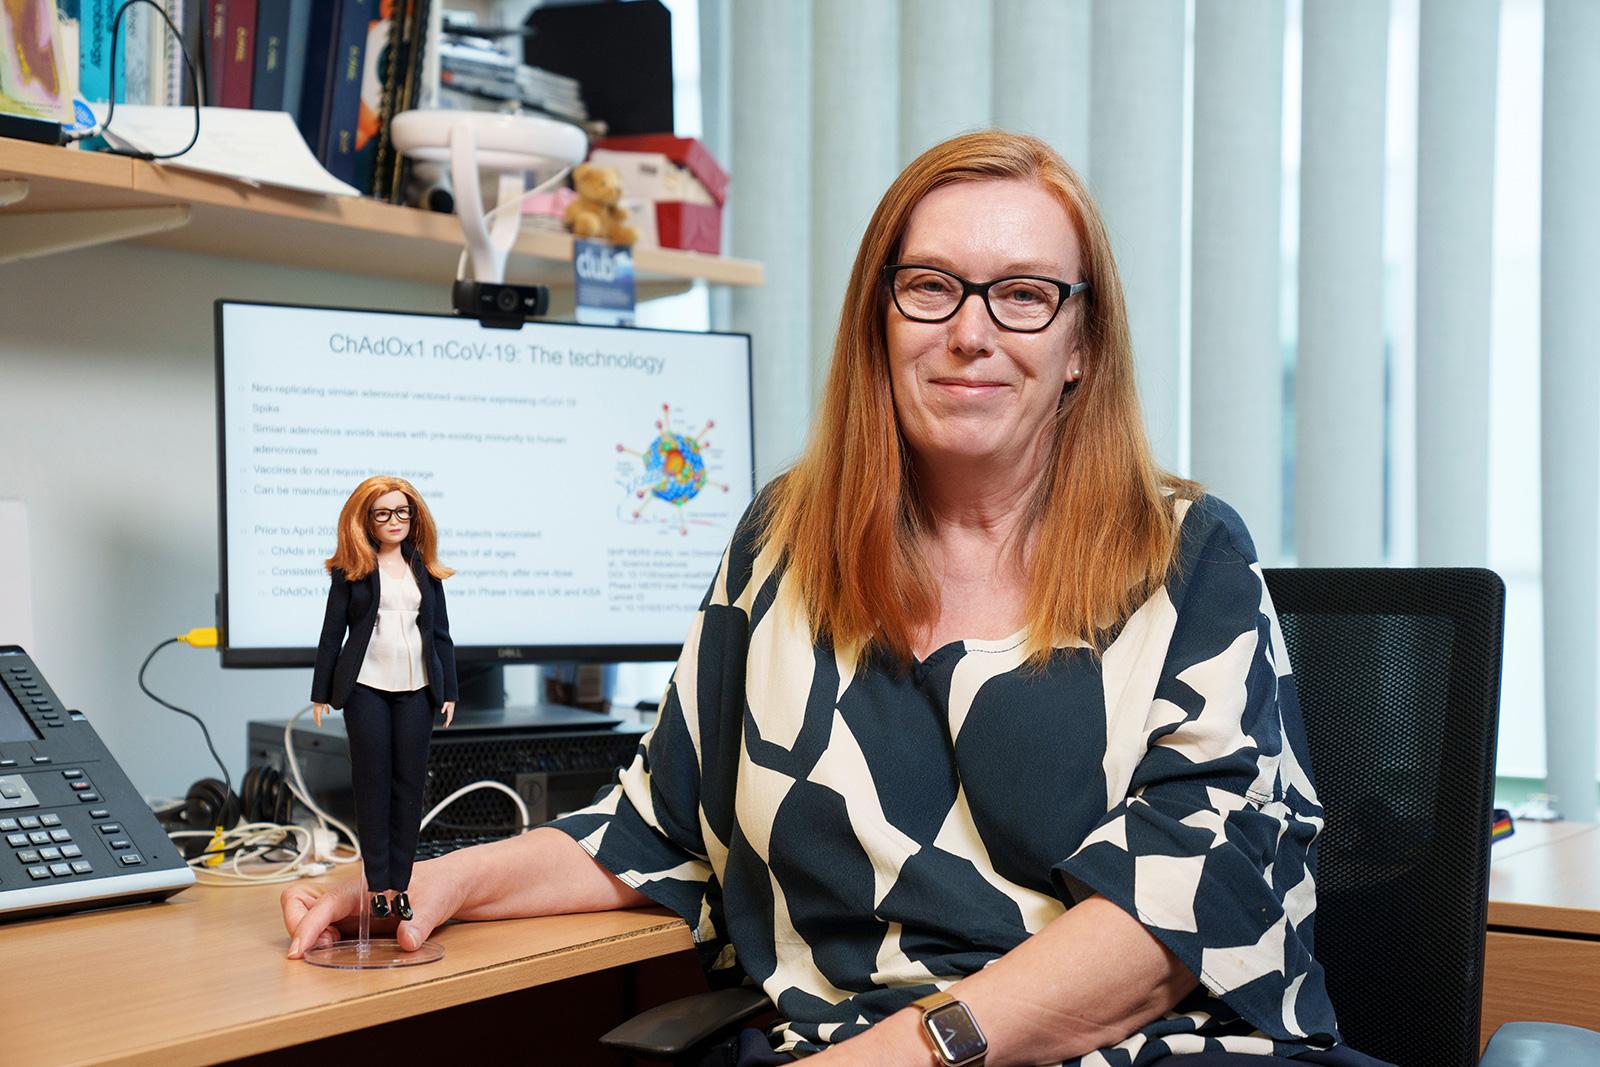 Sarah Gilbert: Barbie debuts doll in likeness of British Covid-19 vaccine  developer - CNN Style